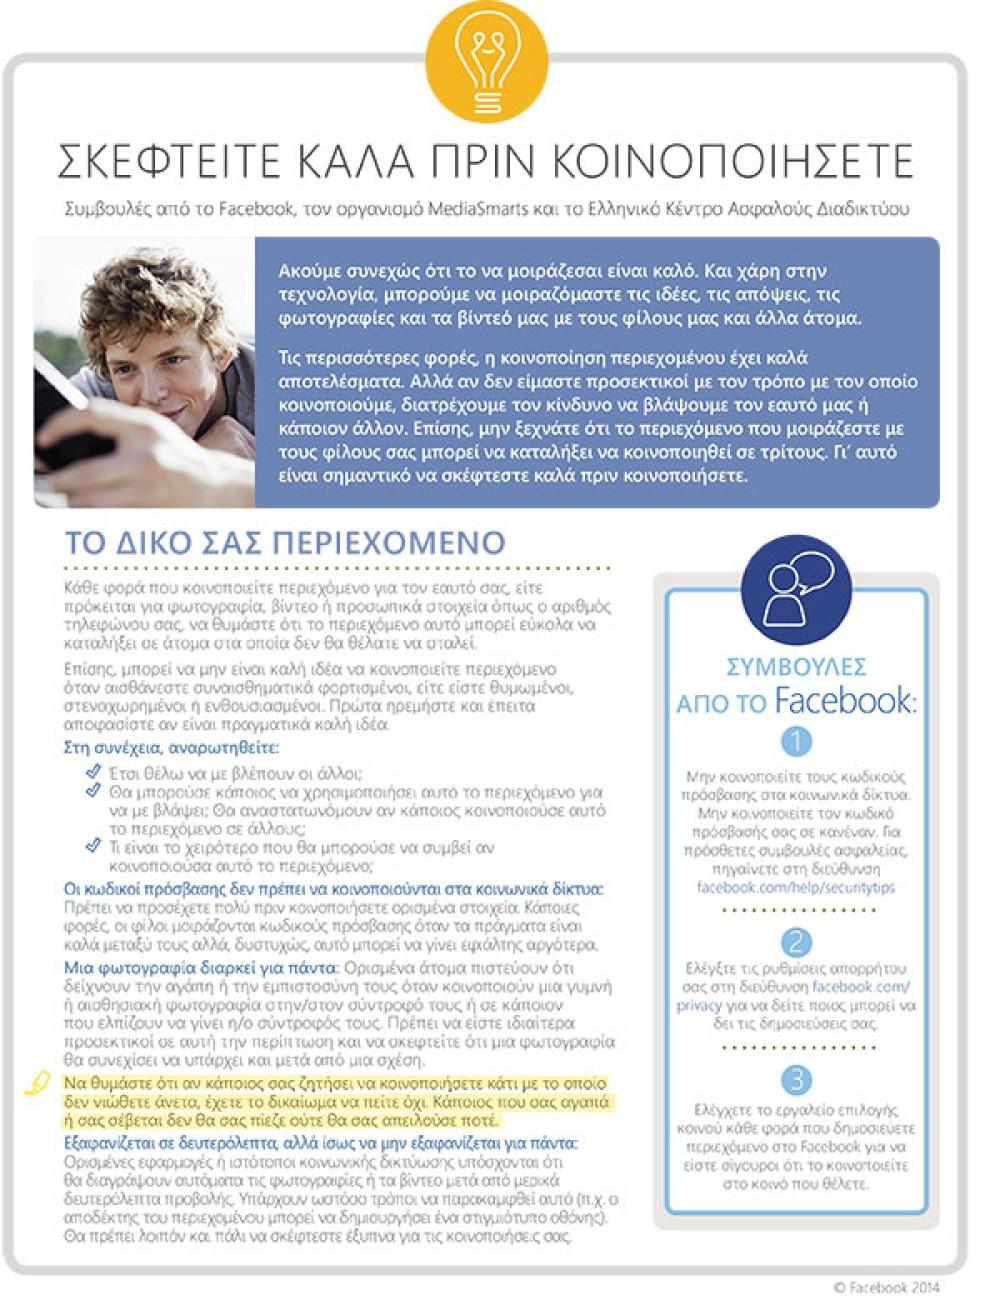 "Facebook: Πρωτοβουλία ""Σκεφτείτε Καλά Πριν Κοινοποιήσετε"" σε συνεργασία με το Ελληνικό Κέντρο Ασφαλούς Διαδικτύου"